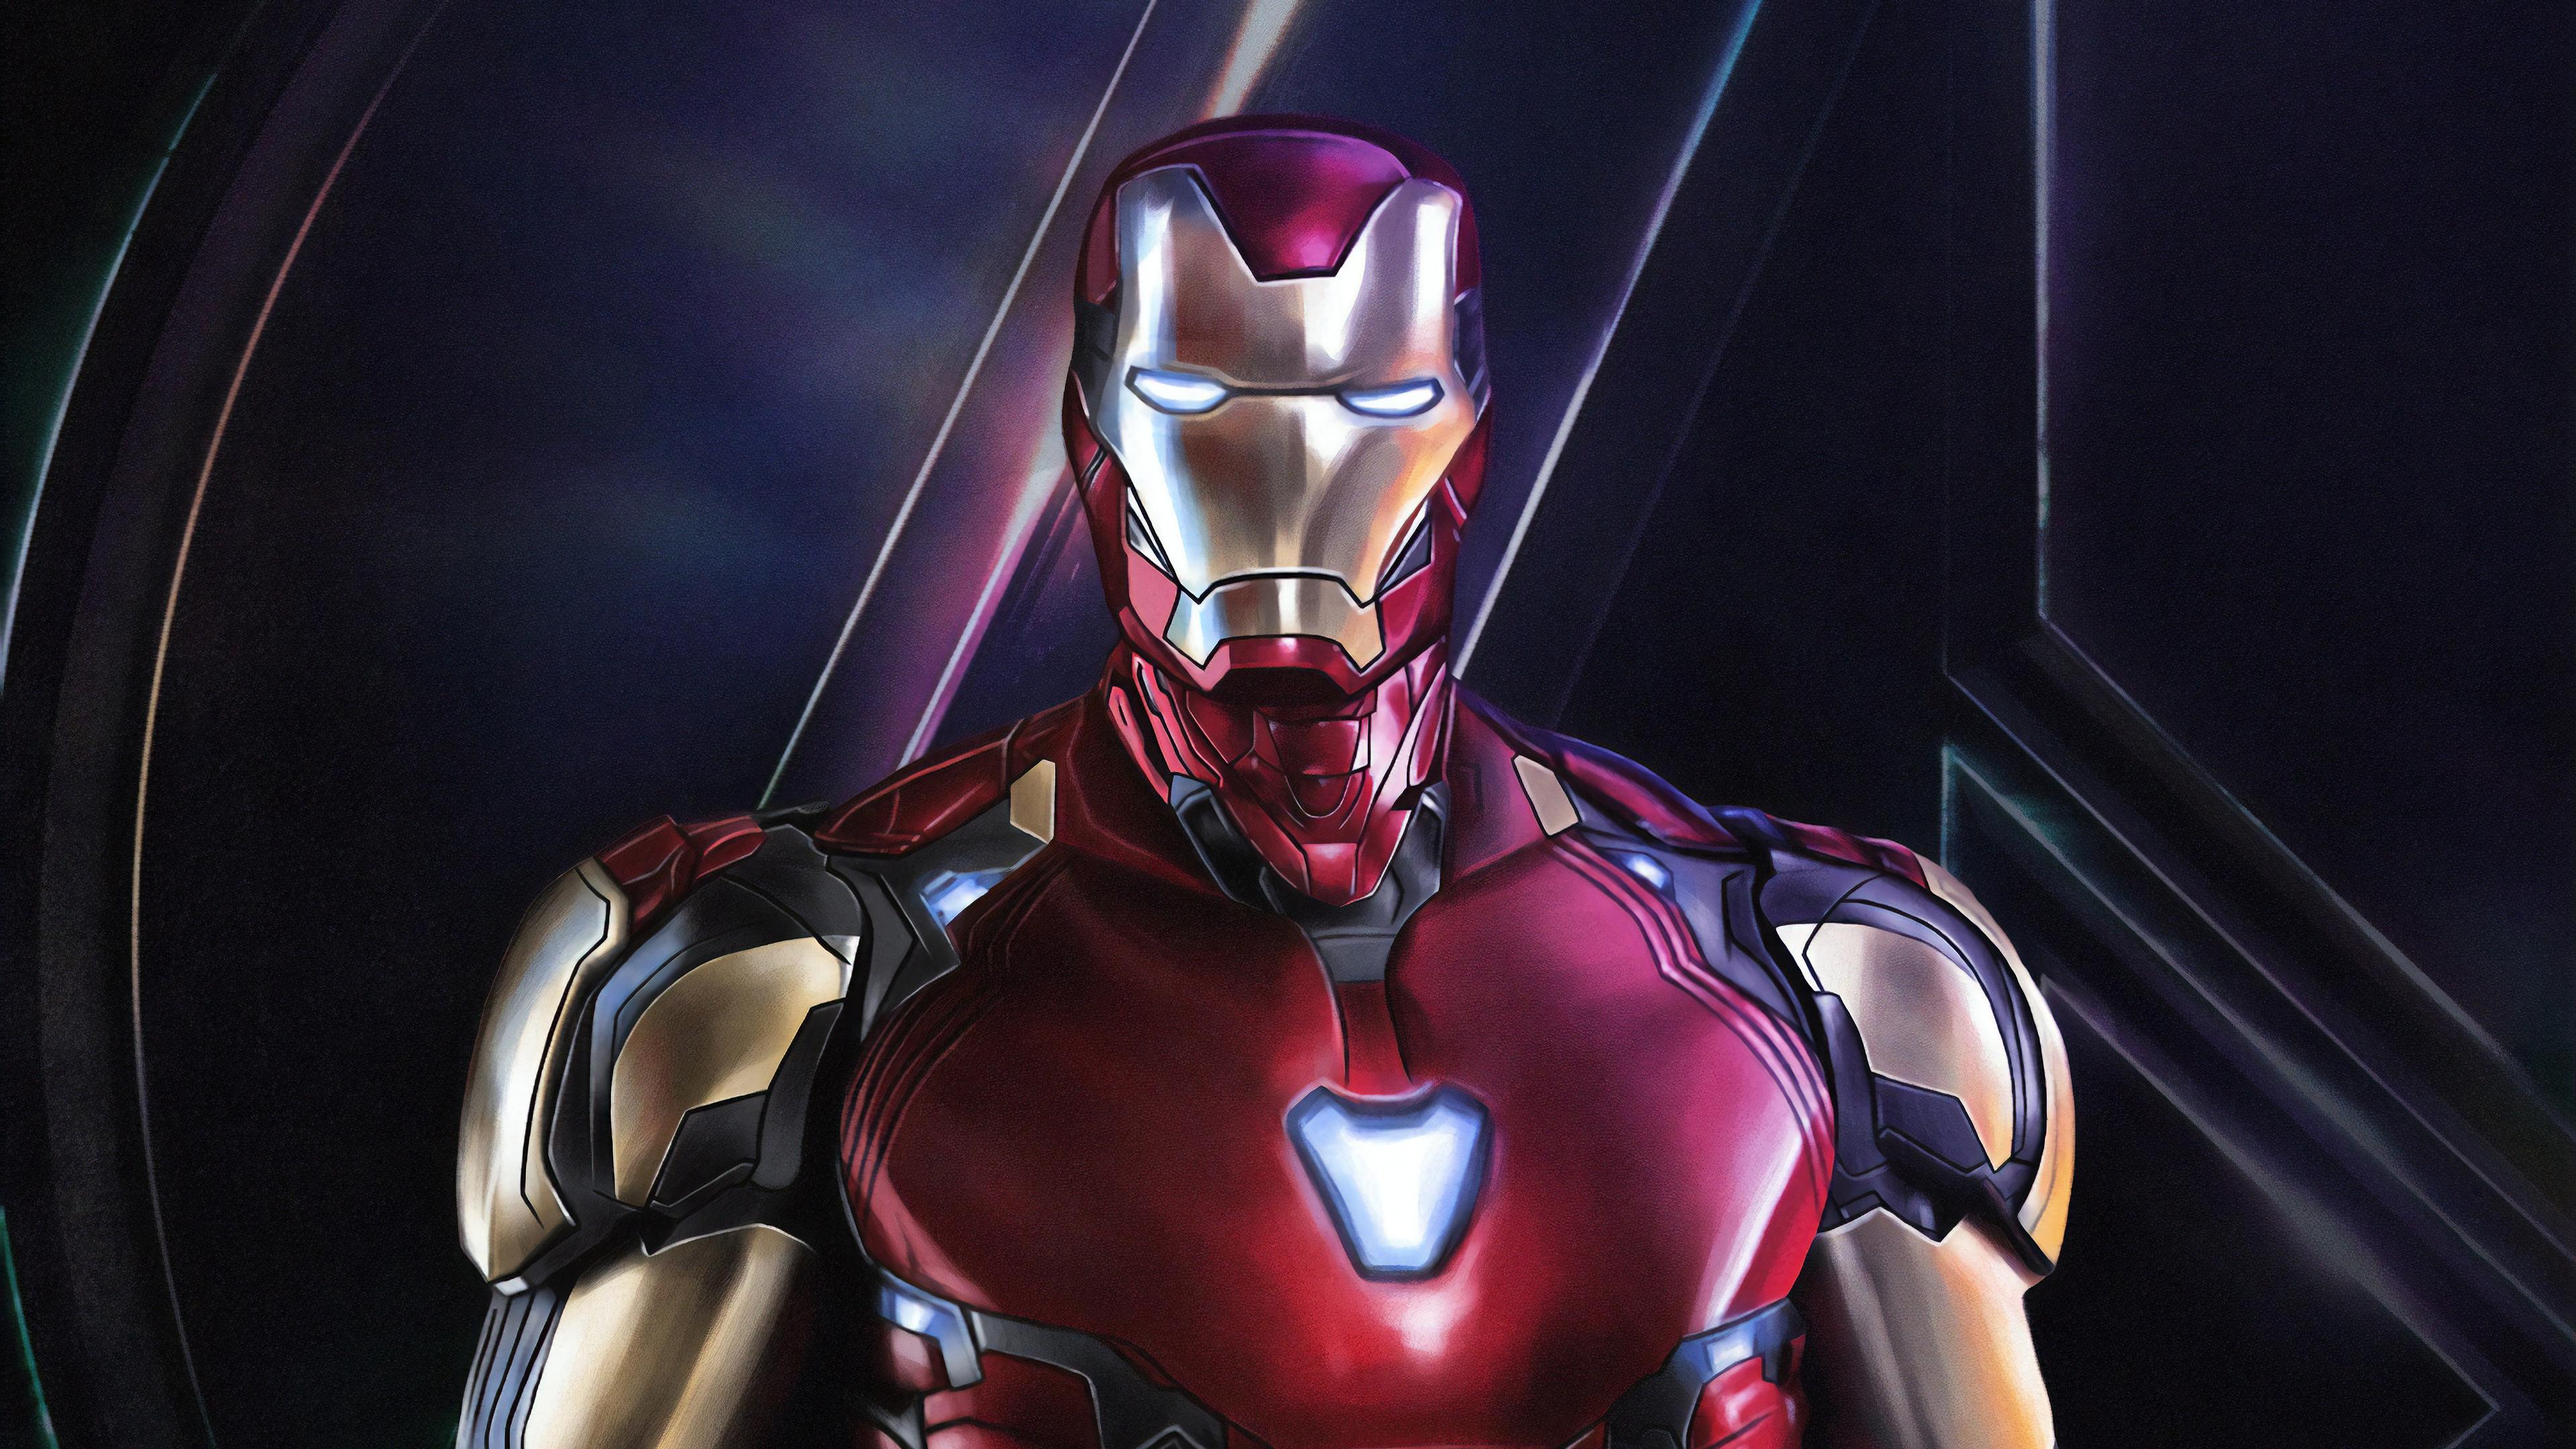 4k iron man avengers endgame hd superheroes 4k wallpapers images backgrounds photos and - Iron man wallpaper 4k ...